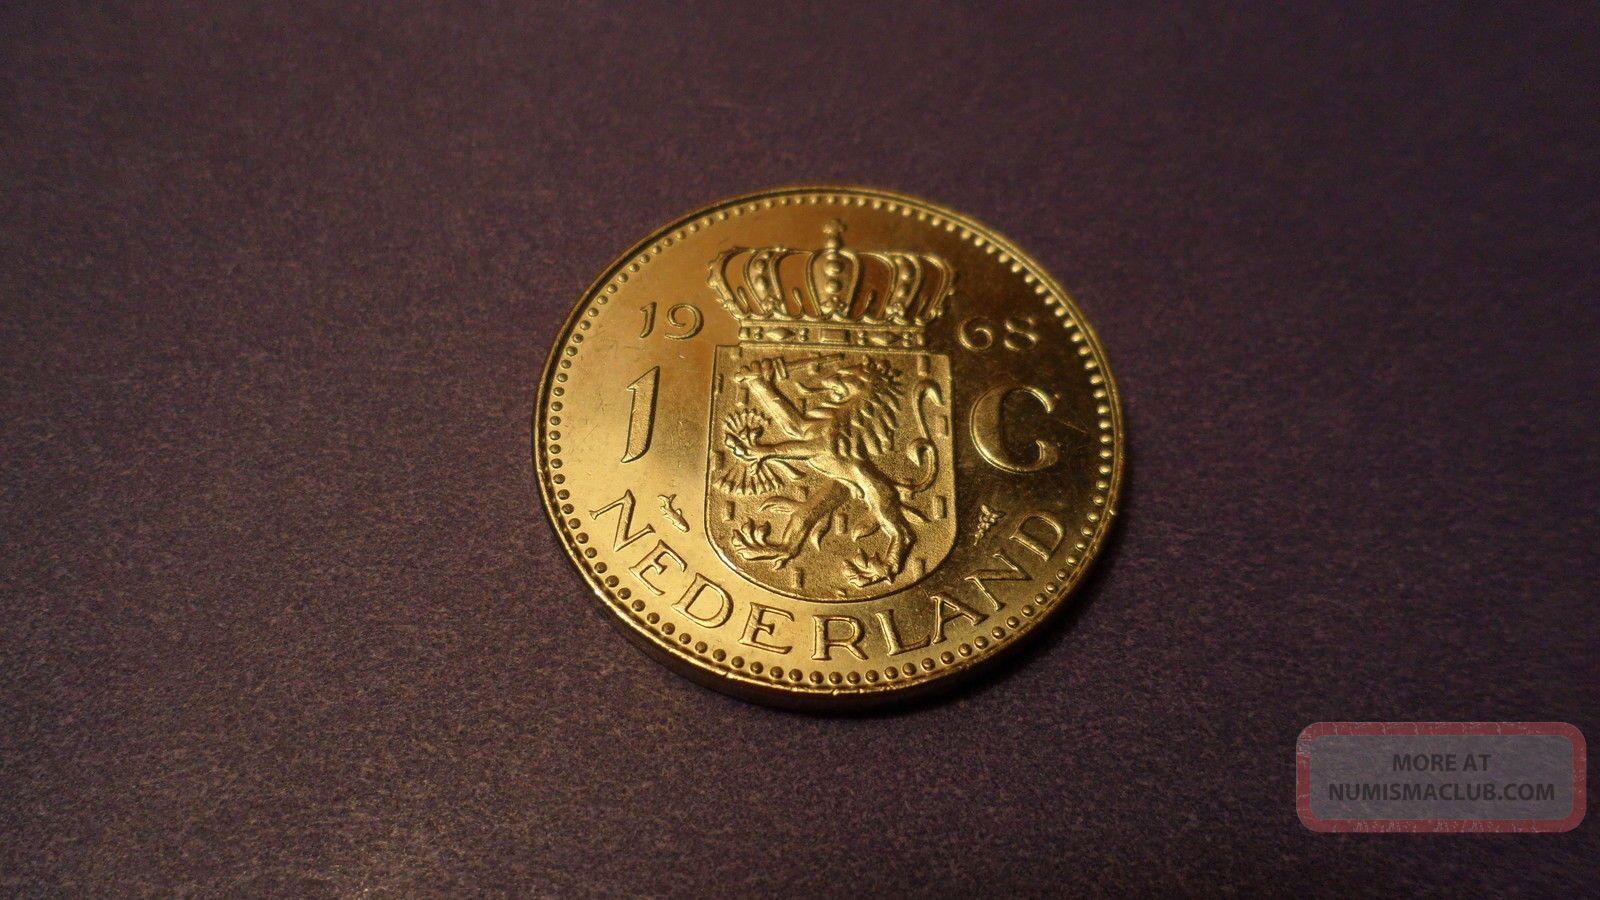 Netherlands 1968,  One Gulden.  Sharp Looking Coin. Coins: World photo